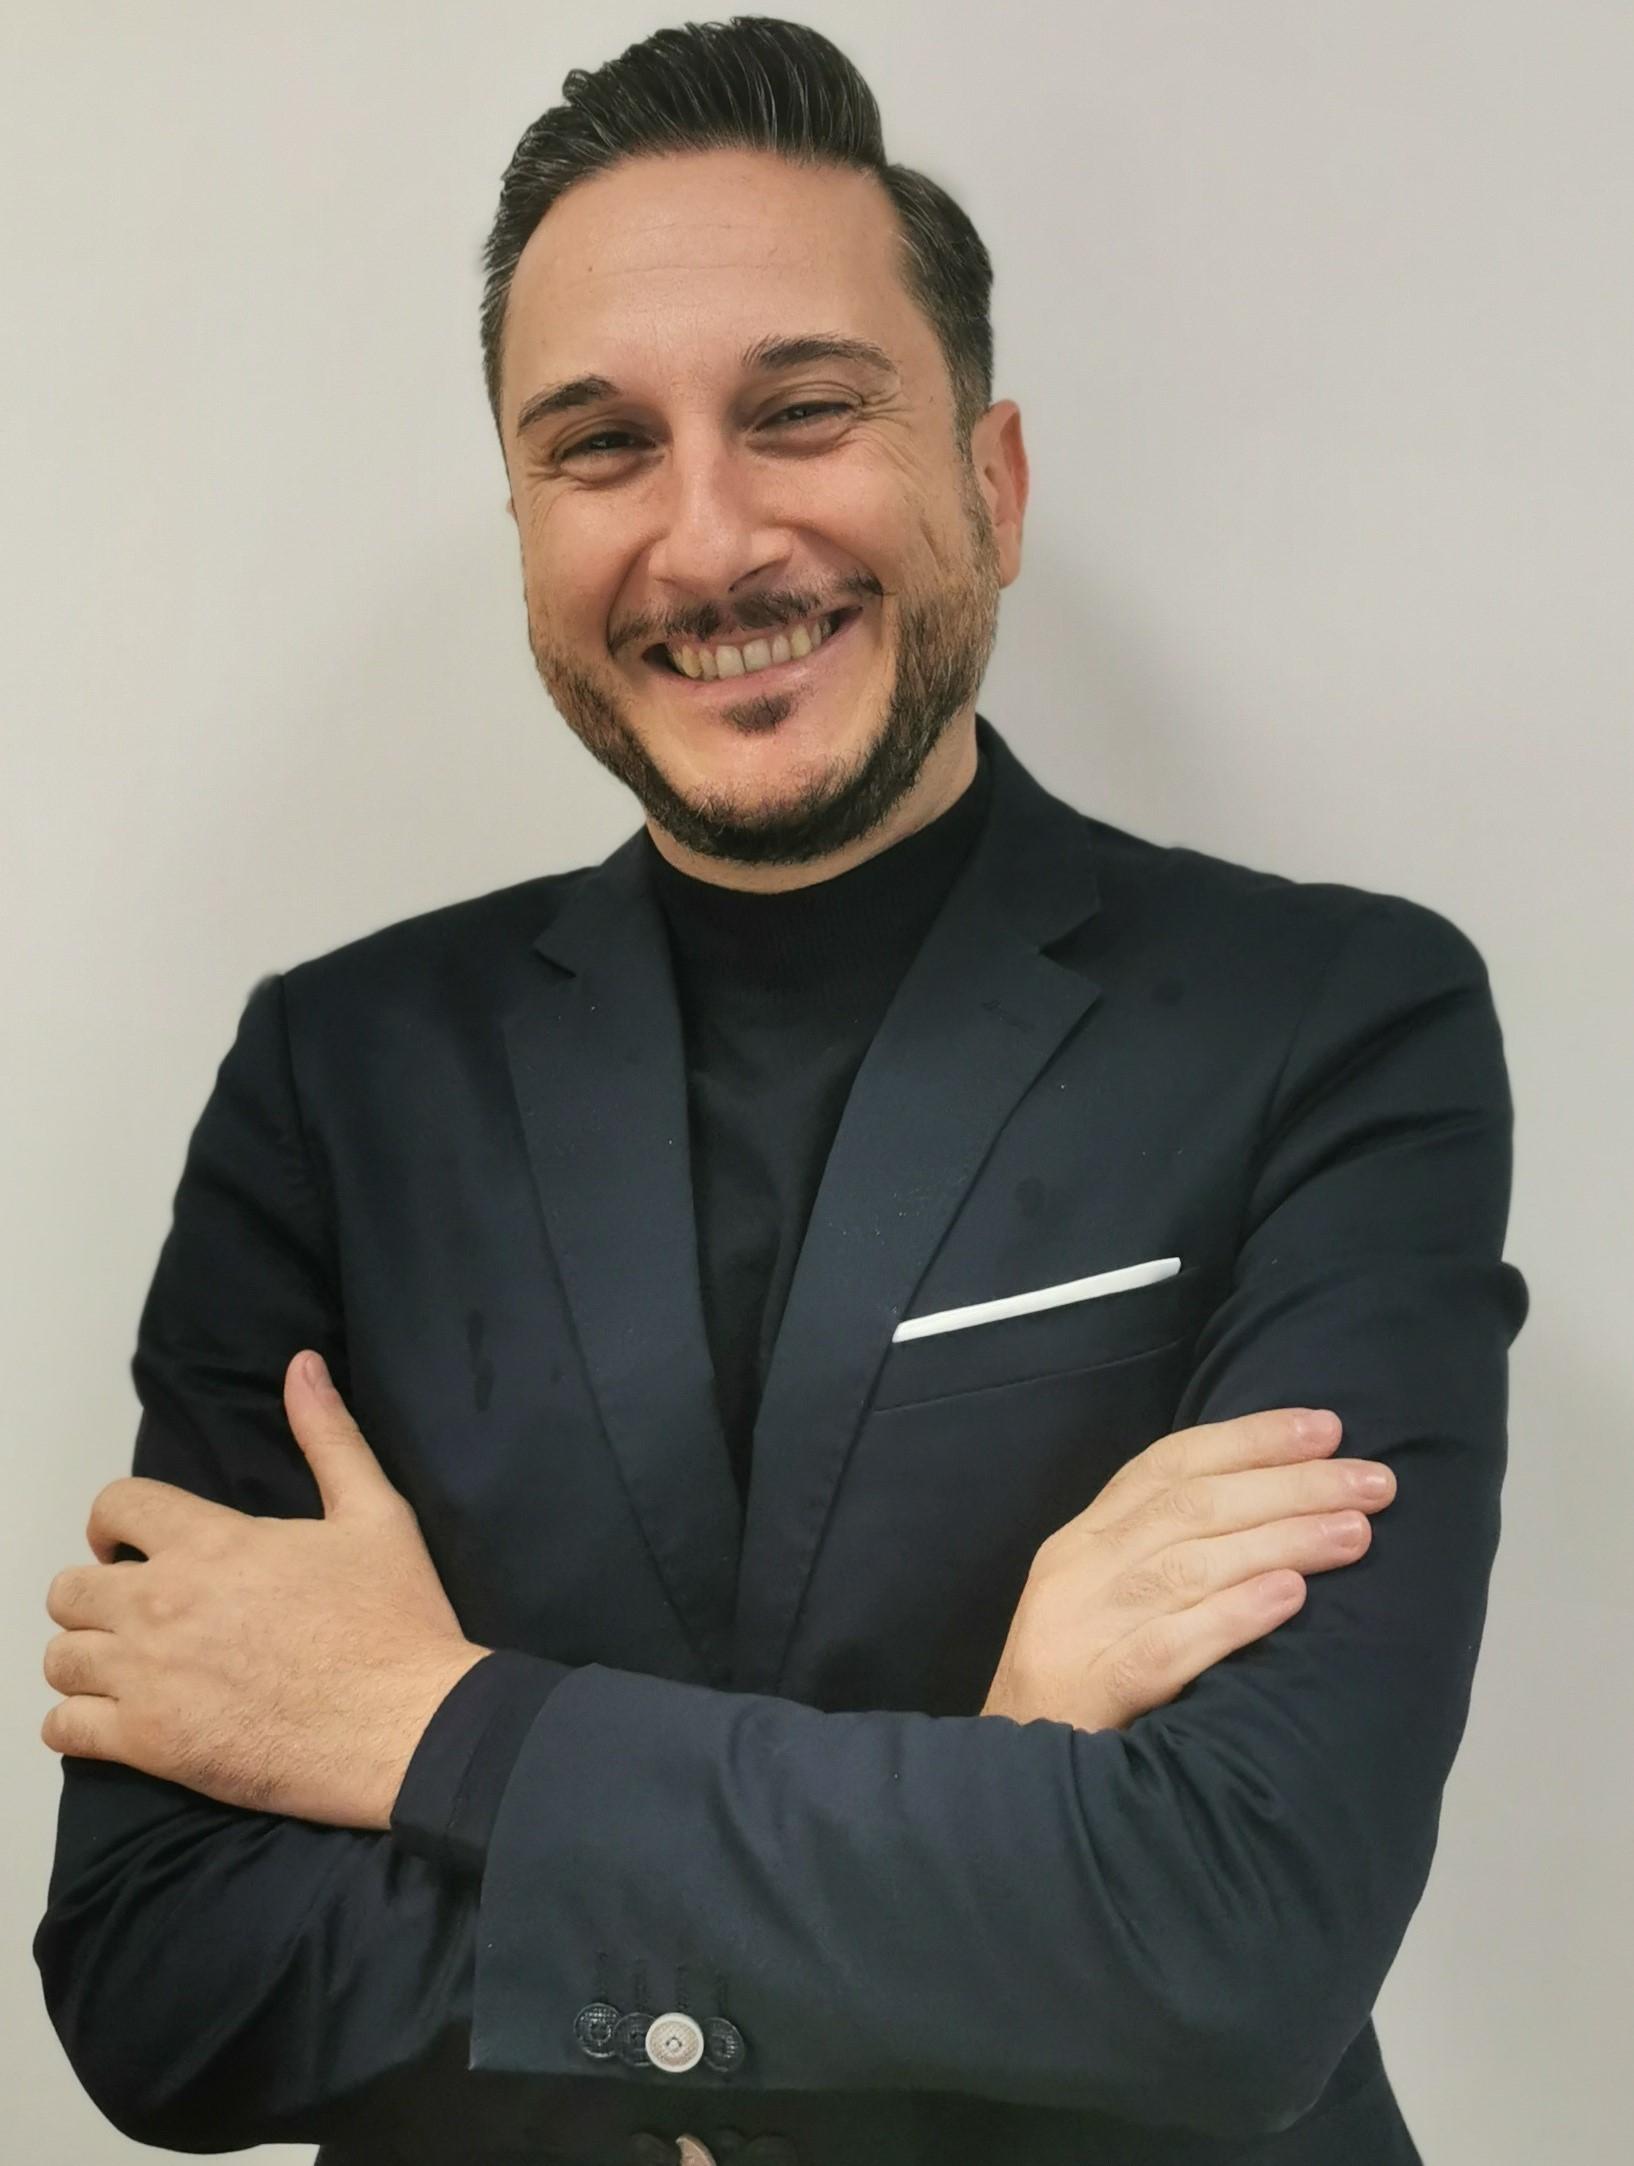 Mario Andreotti